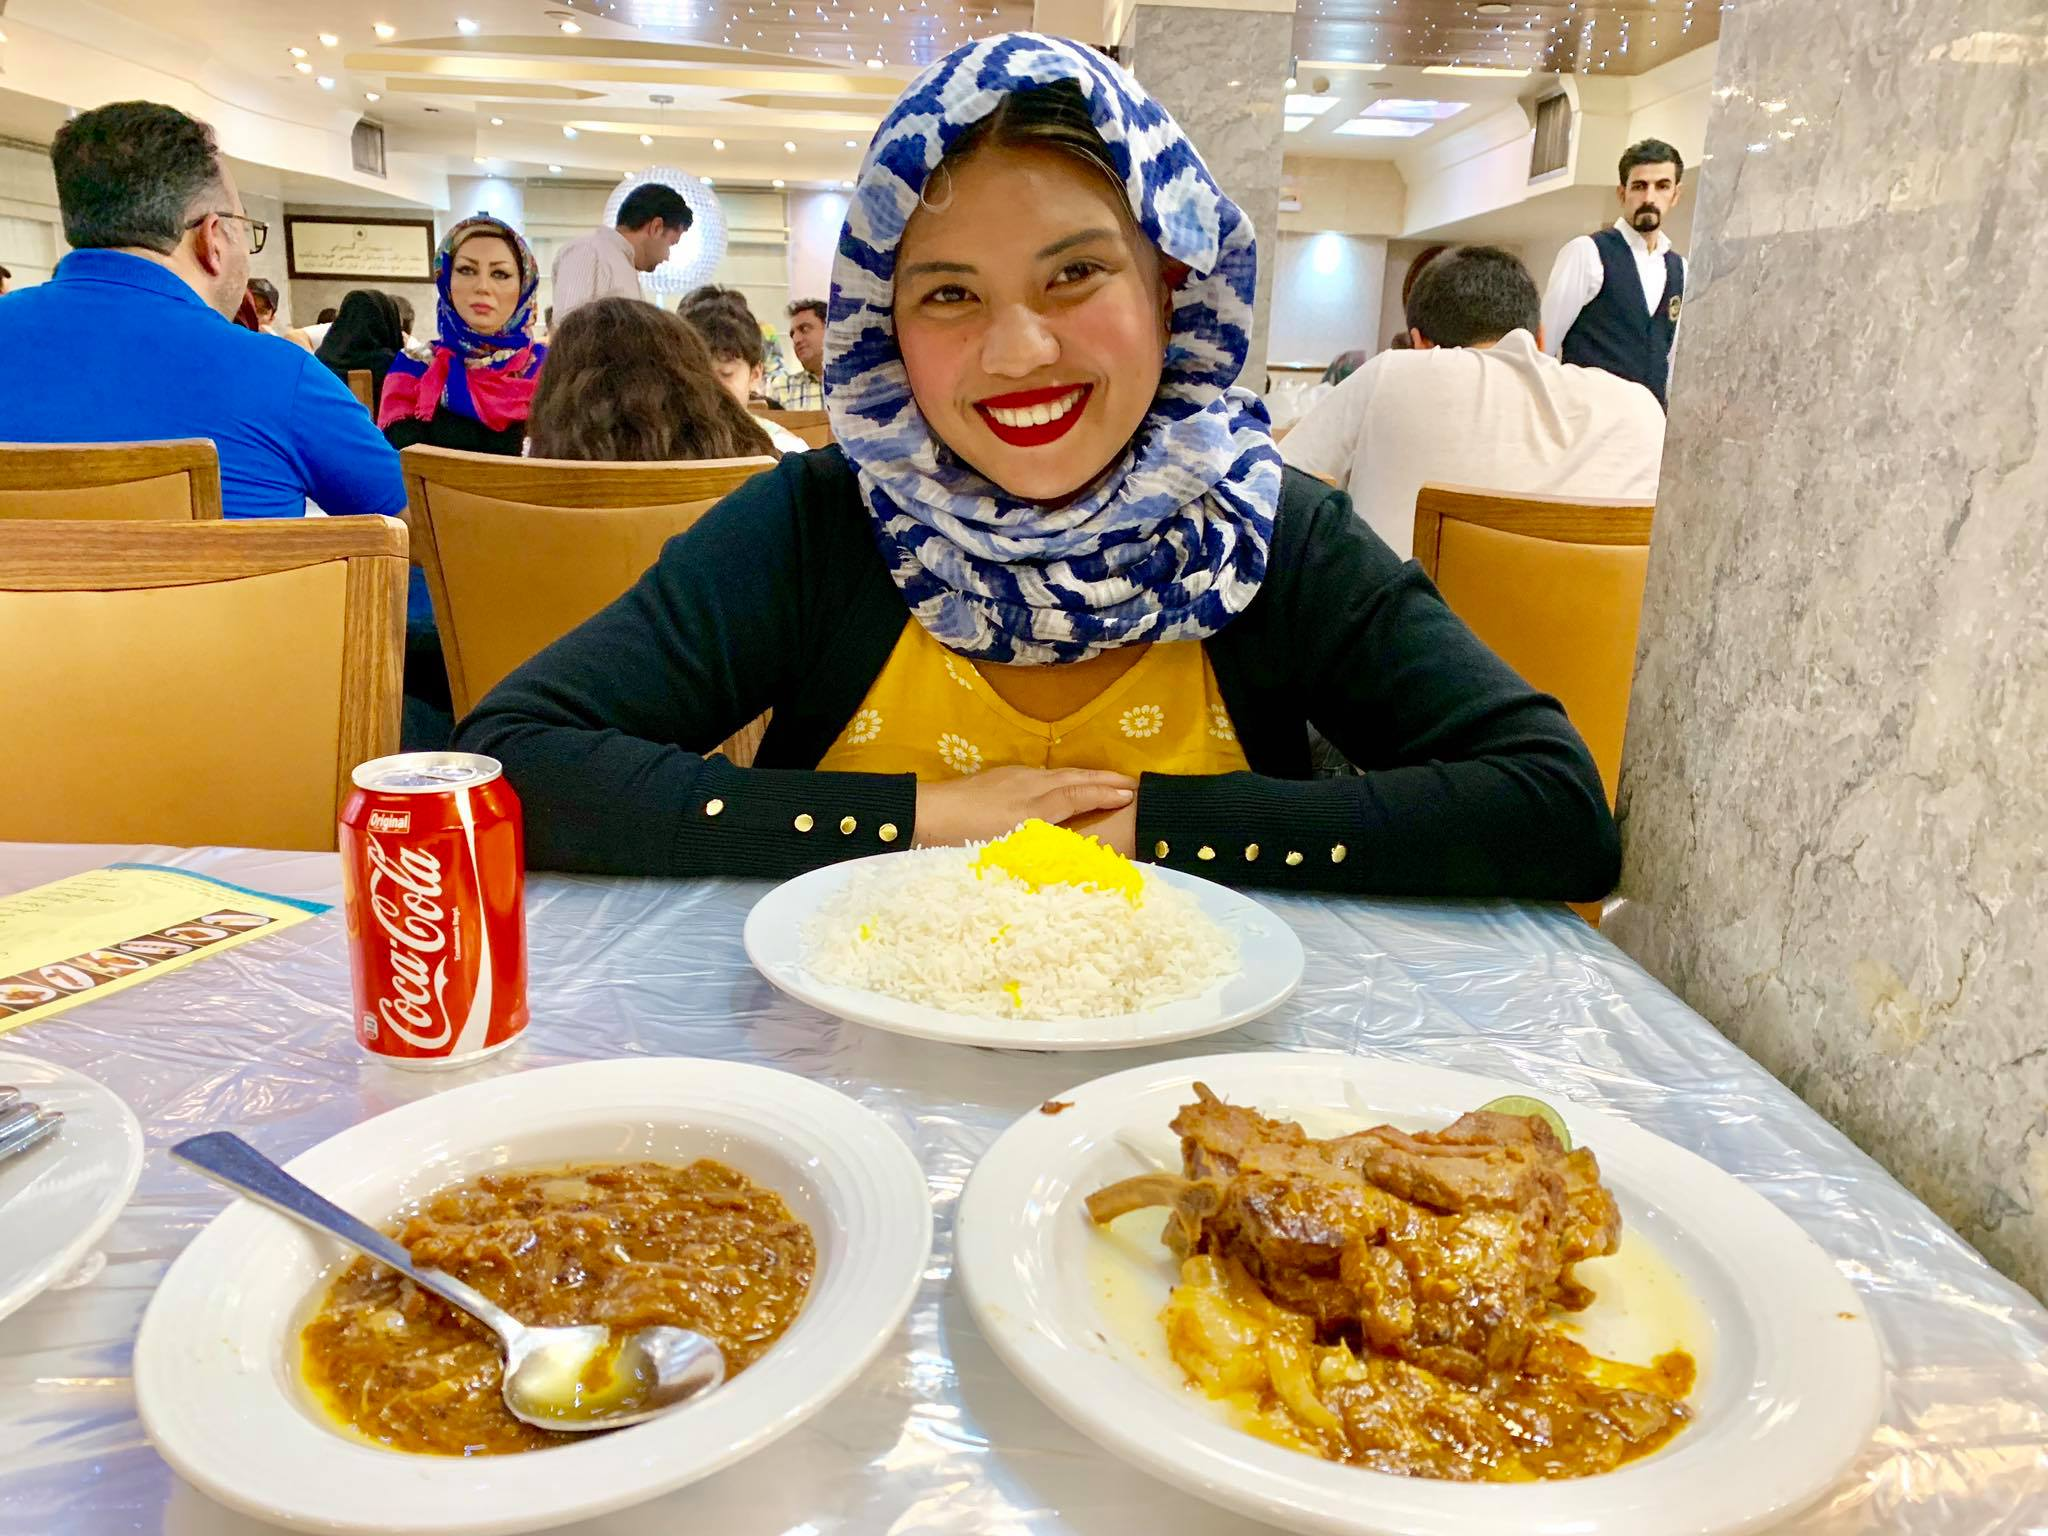 Kach Solo Travels in 2019 Mashhad to Shiraz25.jpg